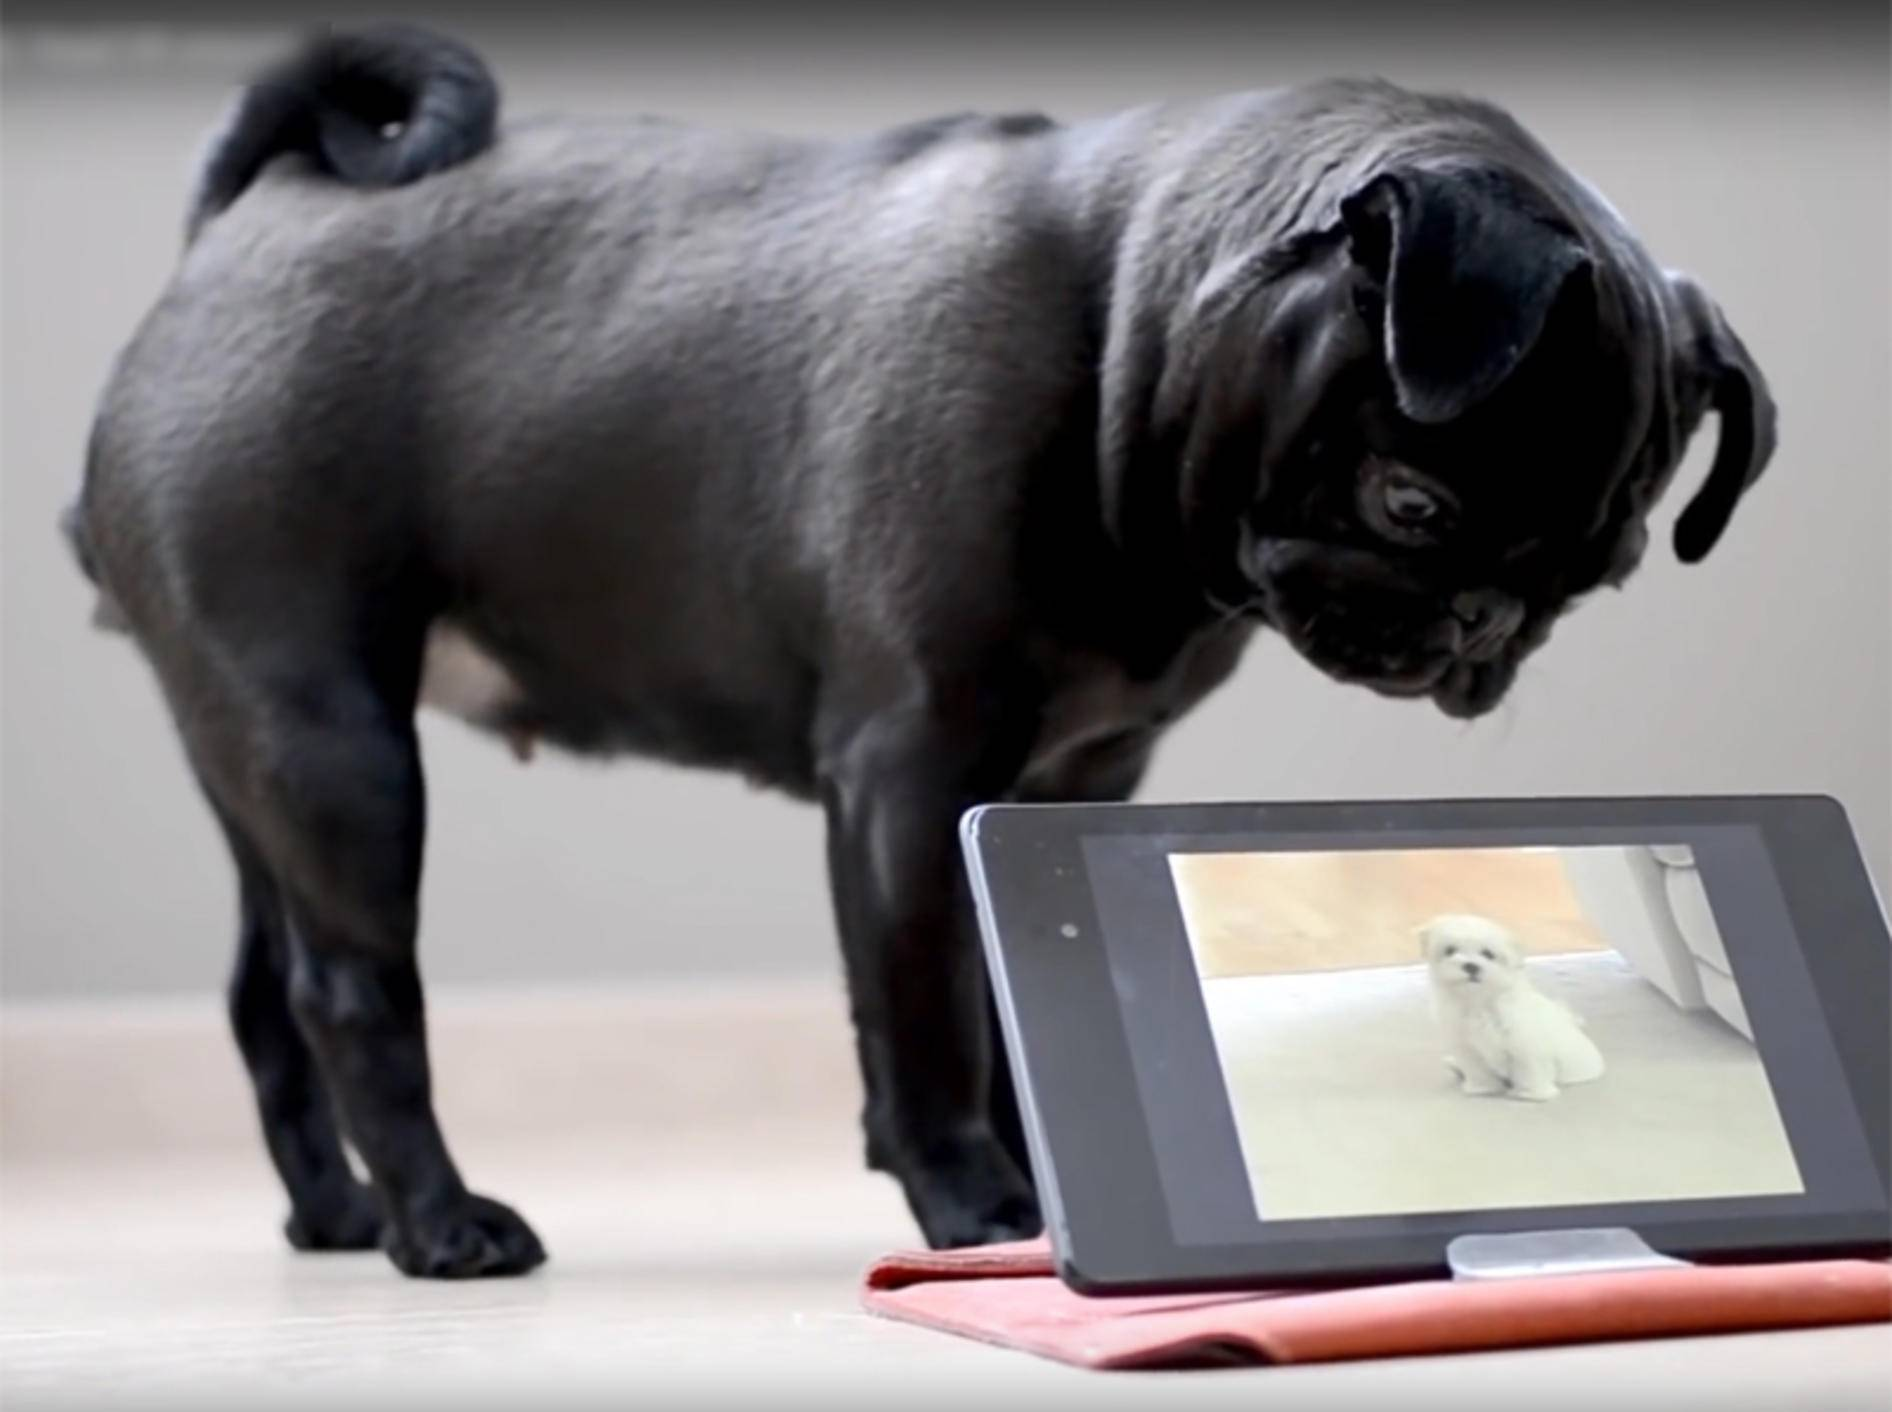 Mops Nao völlig verwirrt von Hundevideo auf dem Tablet – YouTube / Rumble Viral